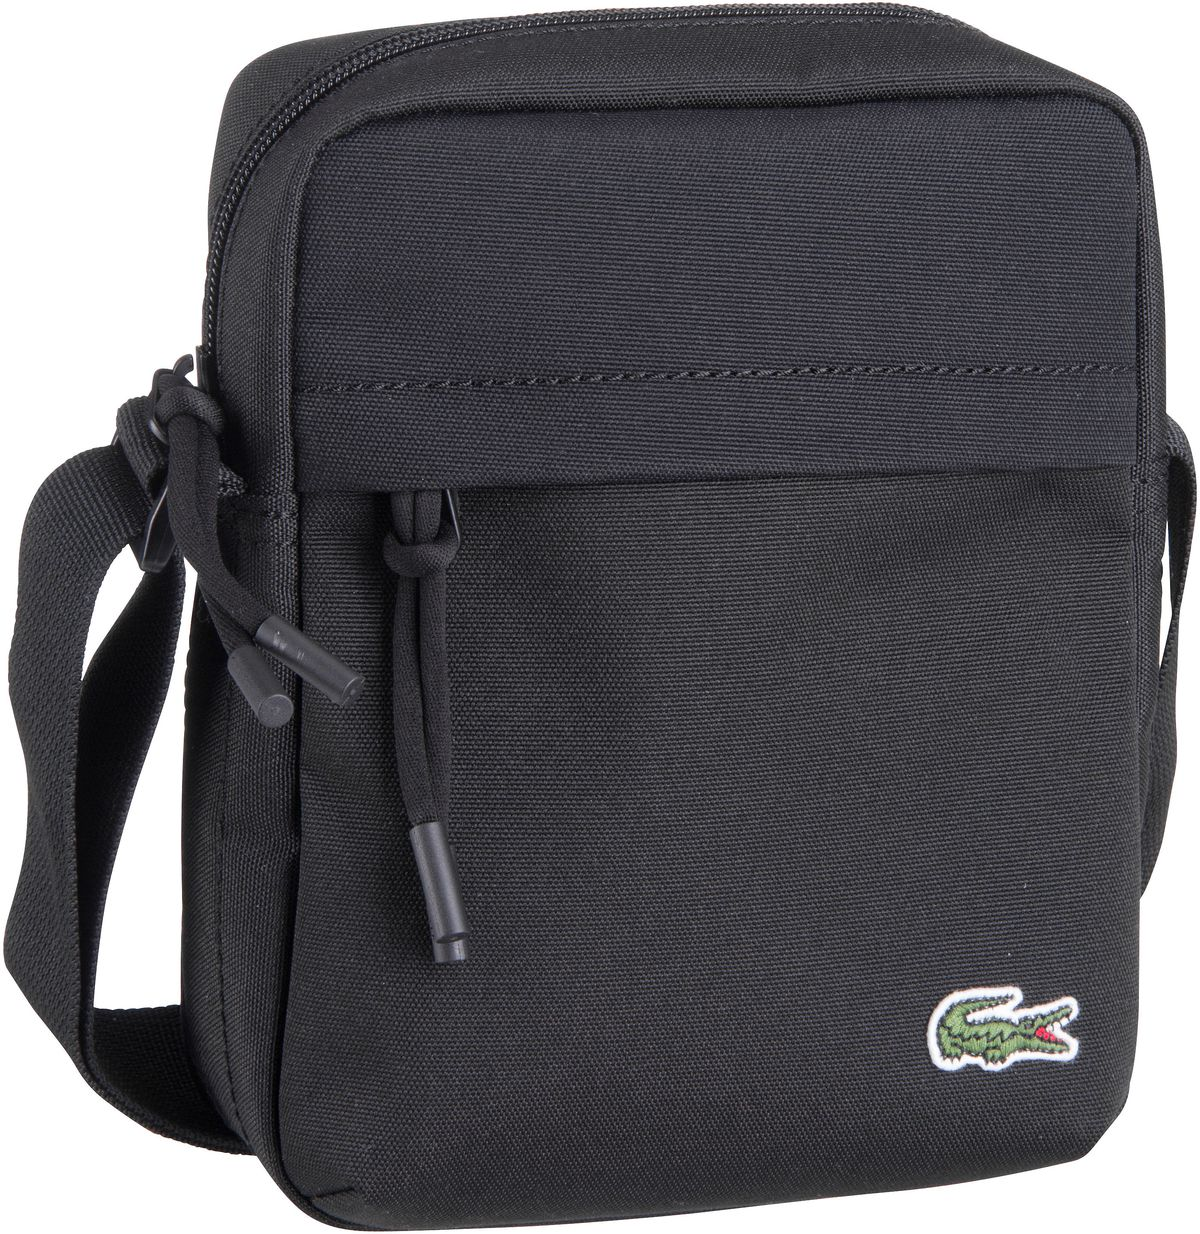 Umhängetasche Neocroc Camera Bag 2102 Black